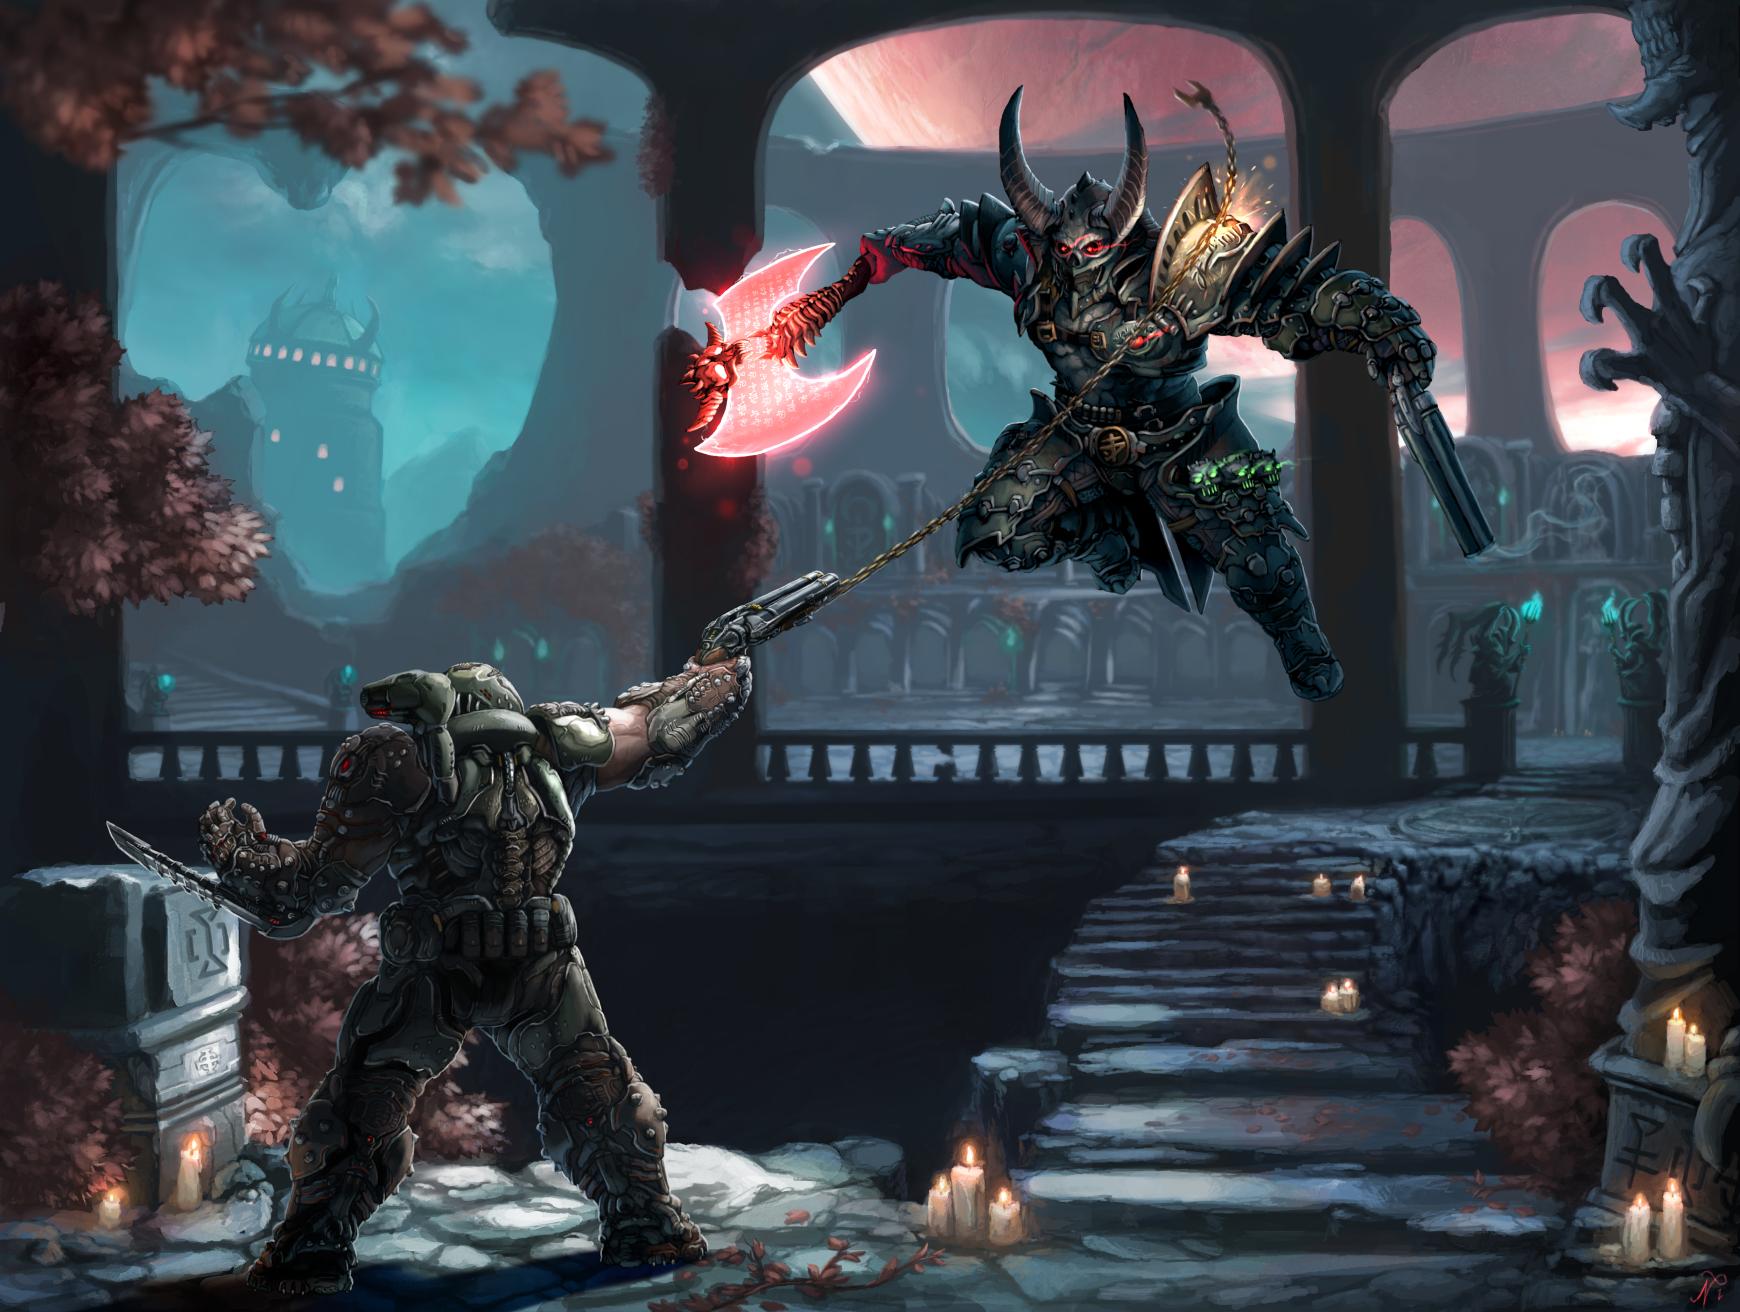 Slayer Vs Marauder By Xous54 On Deviantart